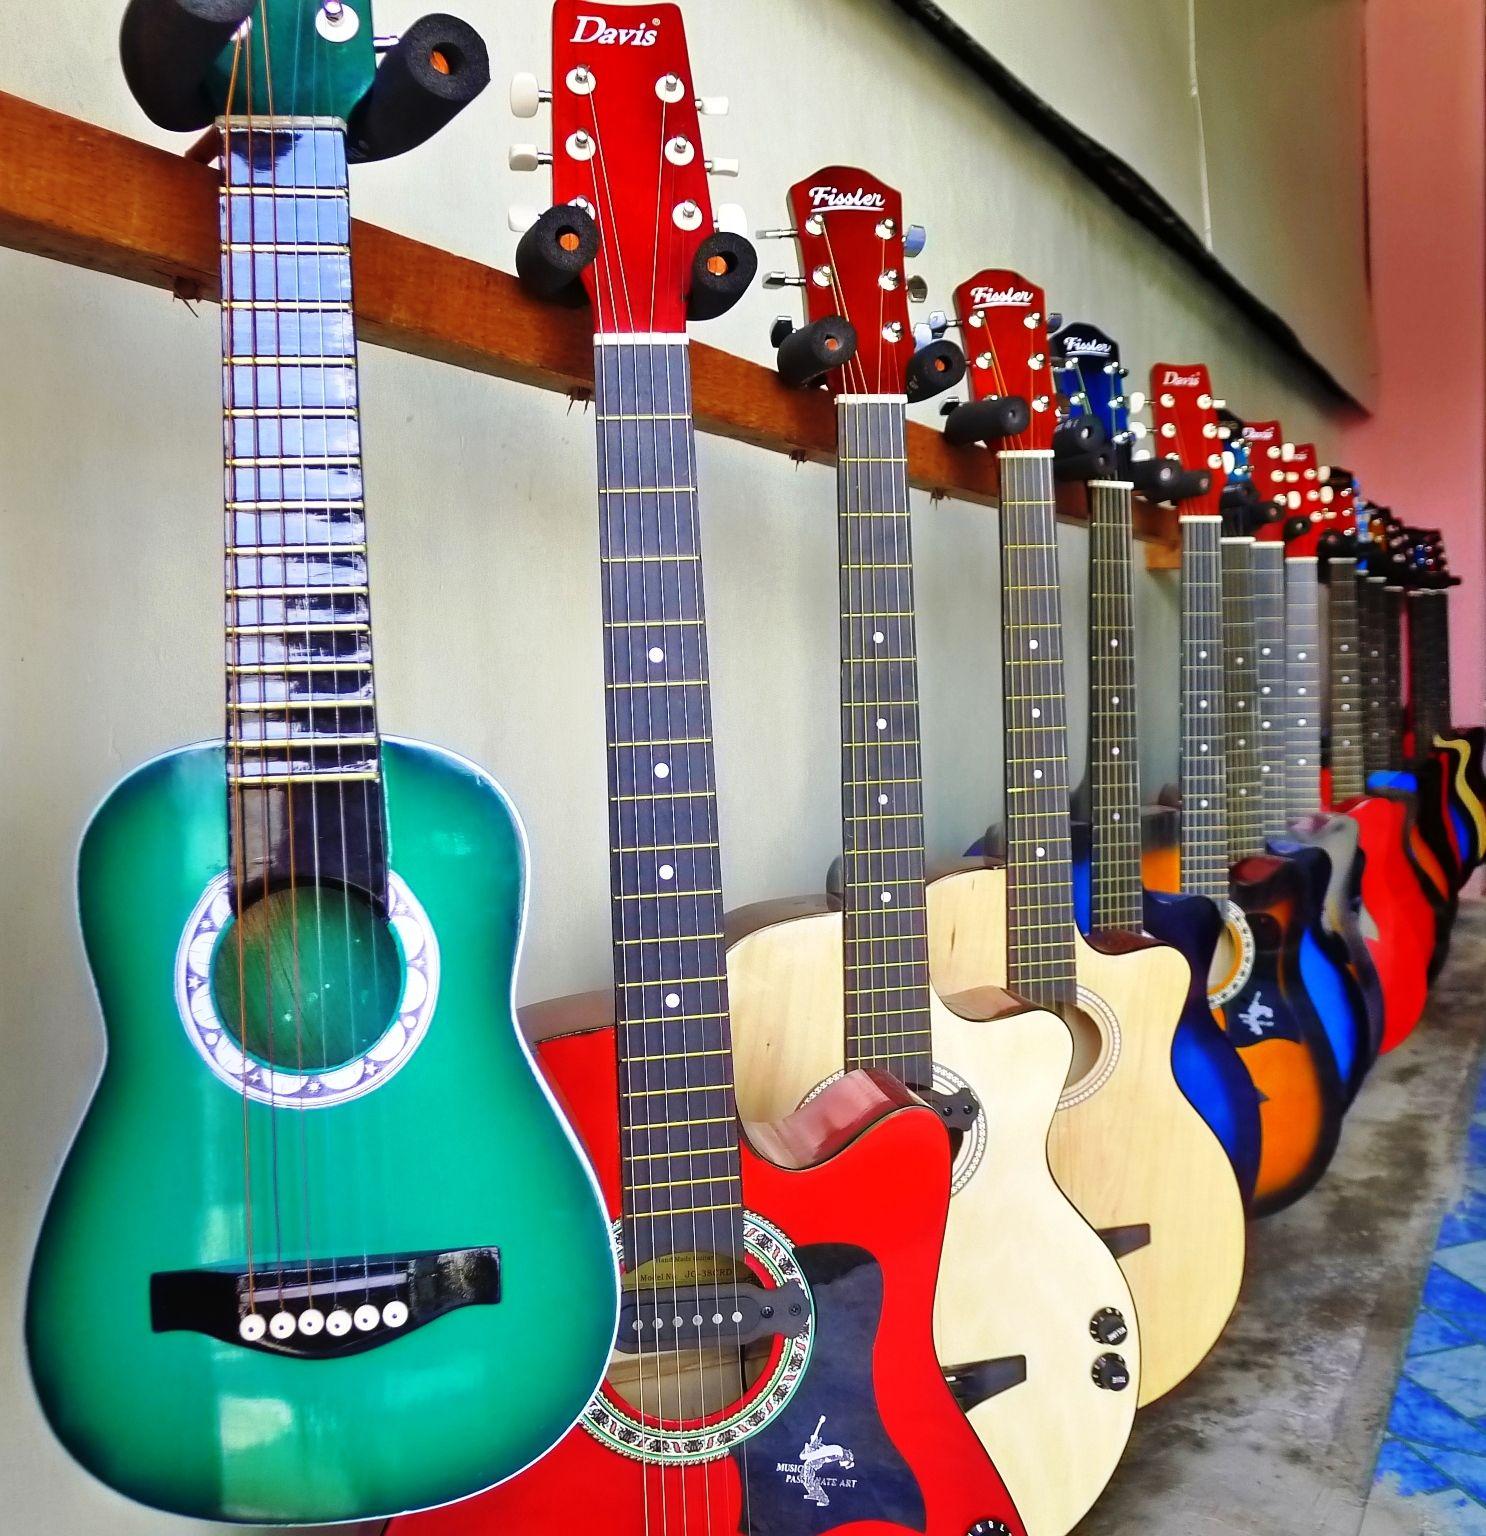 Guitar Factory Cebu City Philippines Cebu Cebu City Philippines